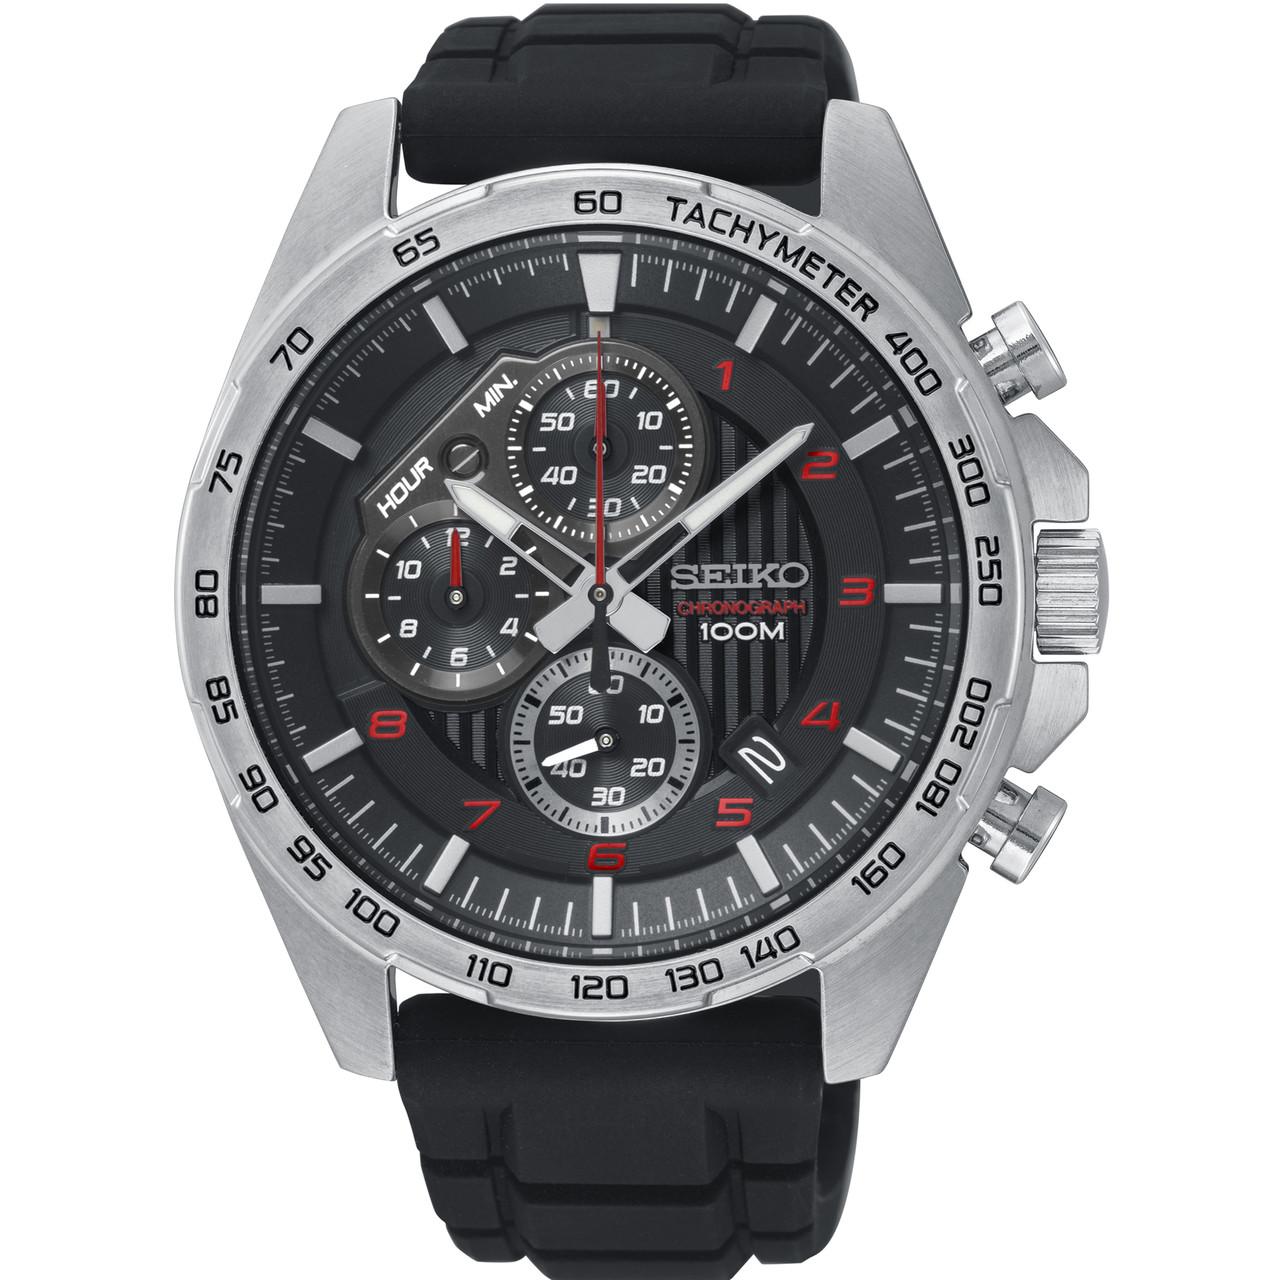 65ea40933 Seiko Motorsport Men's Chronograph Watch SSB325P1 | WatchO™